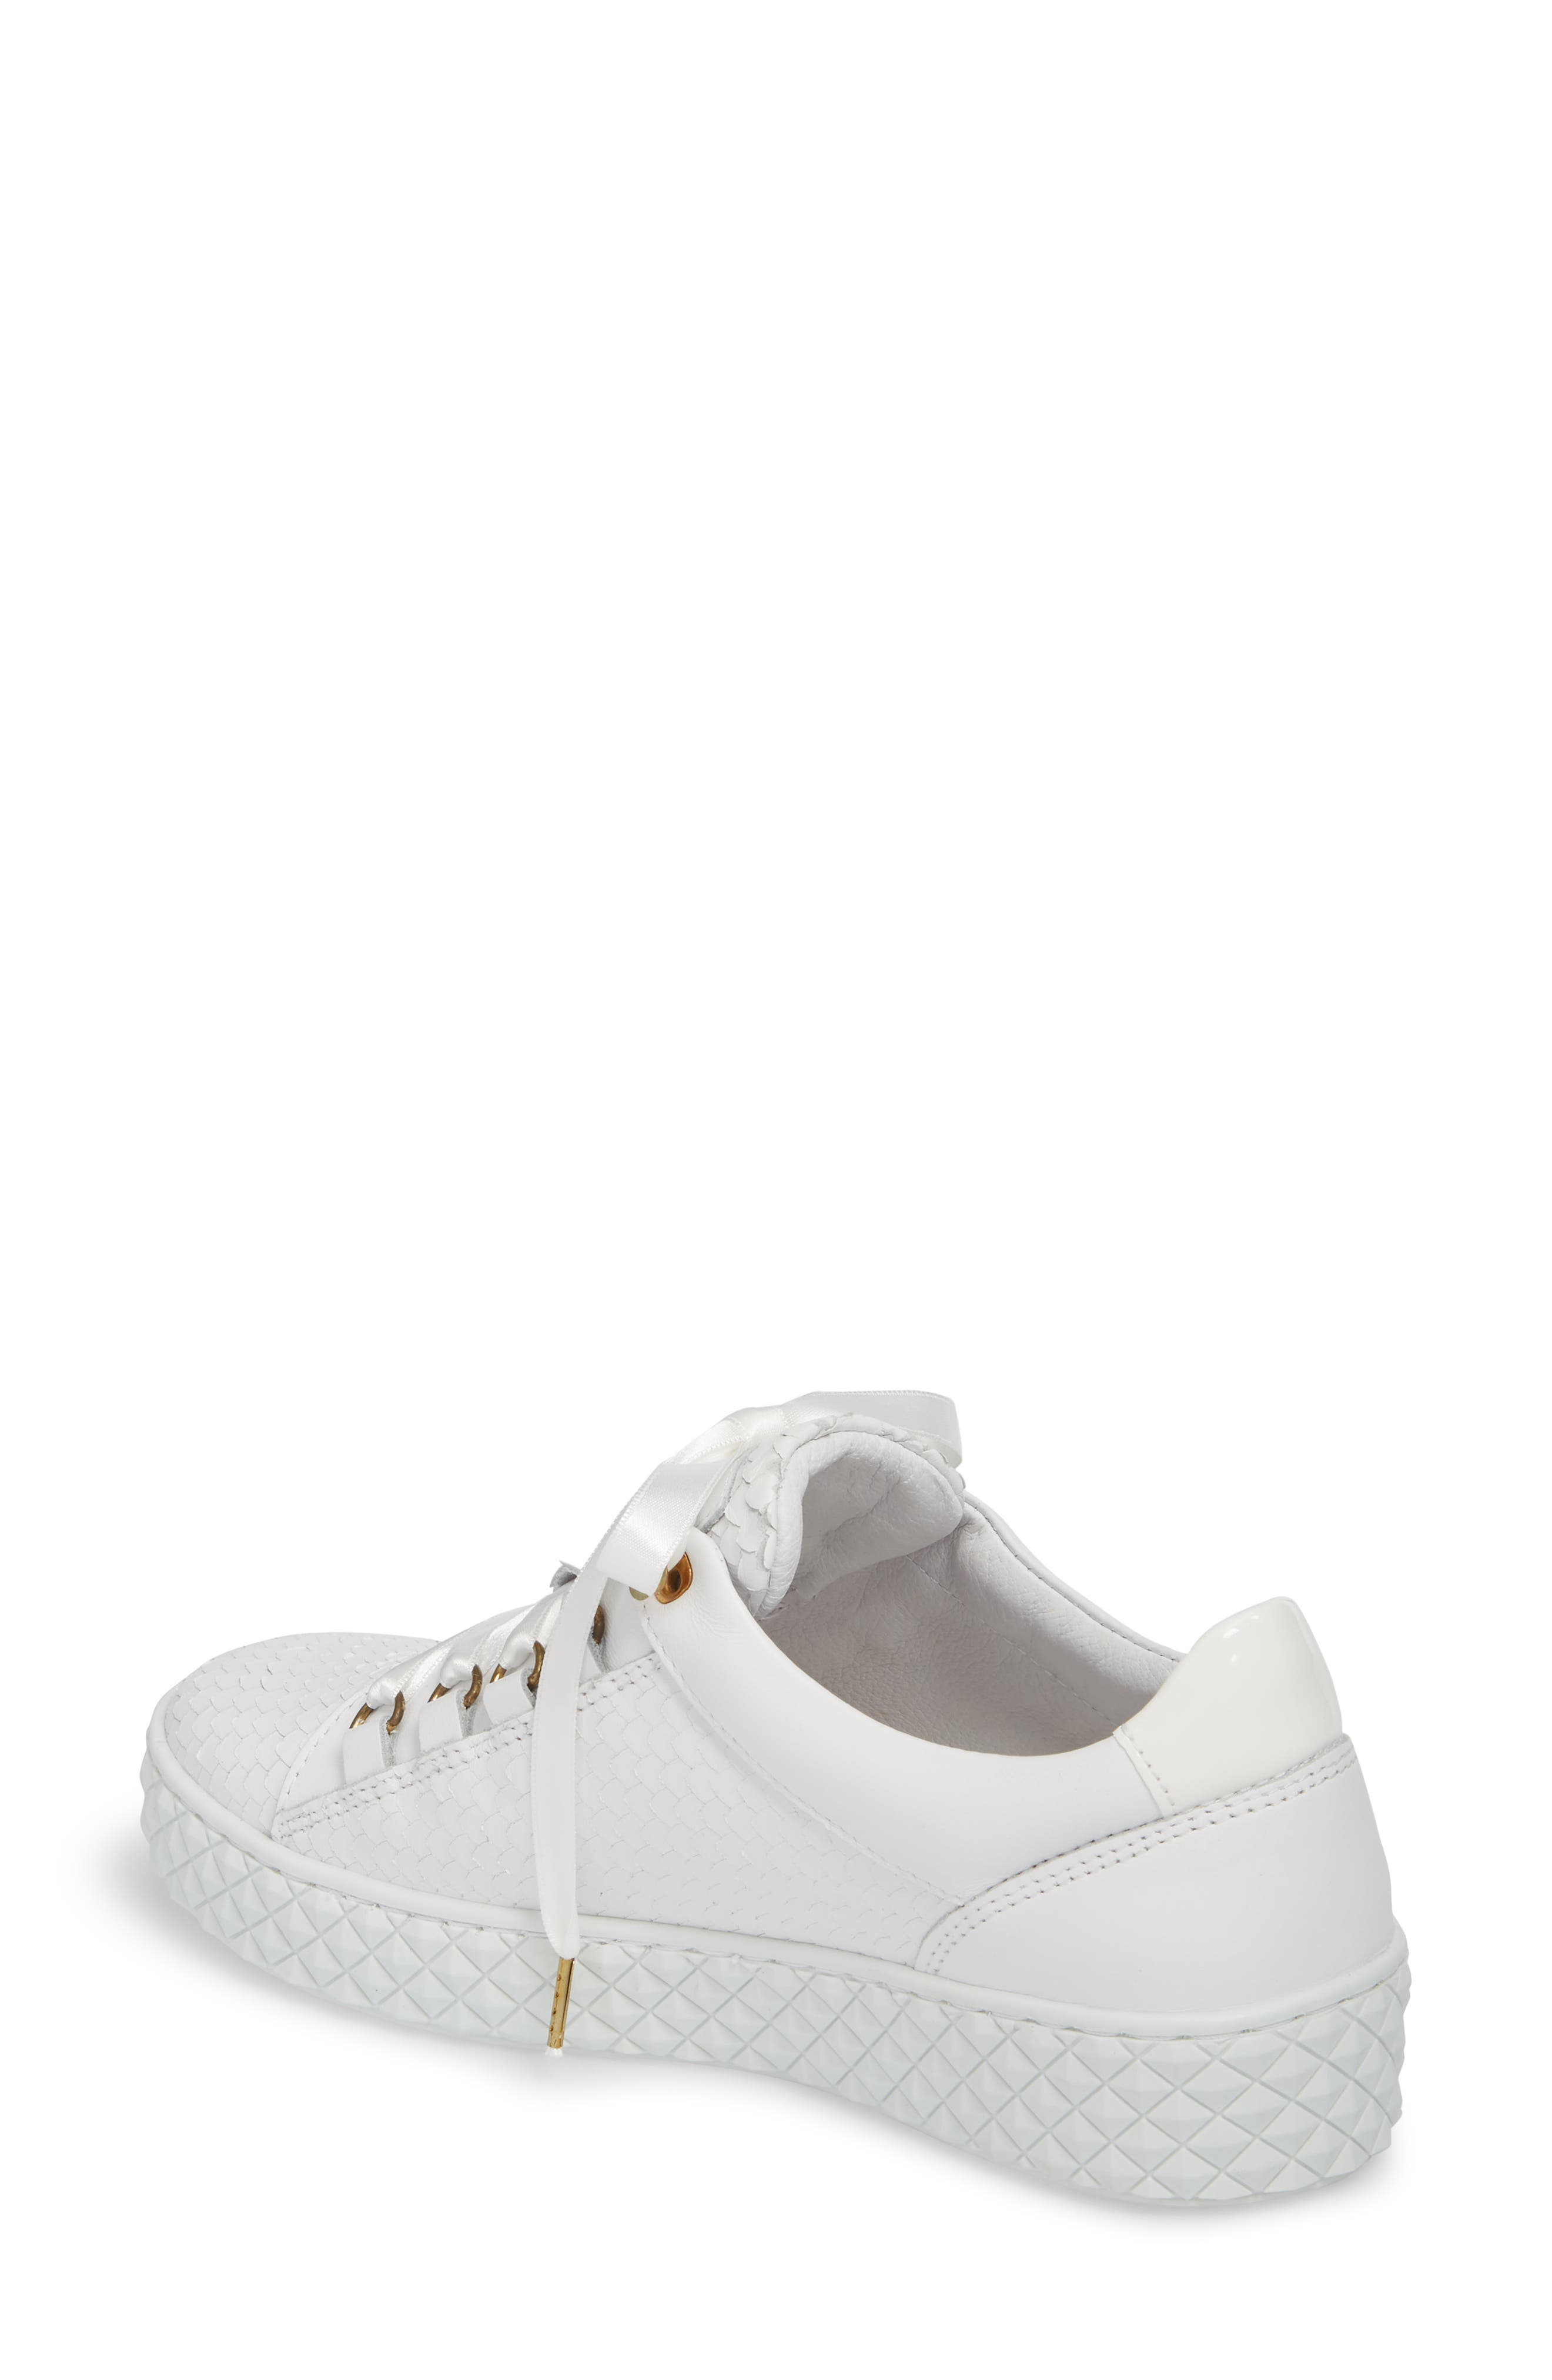 Seoul Sneaker,                             Alternate thumbnail 2, color,